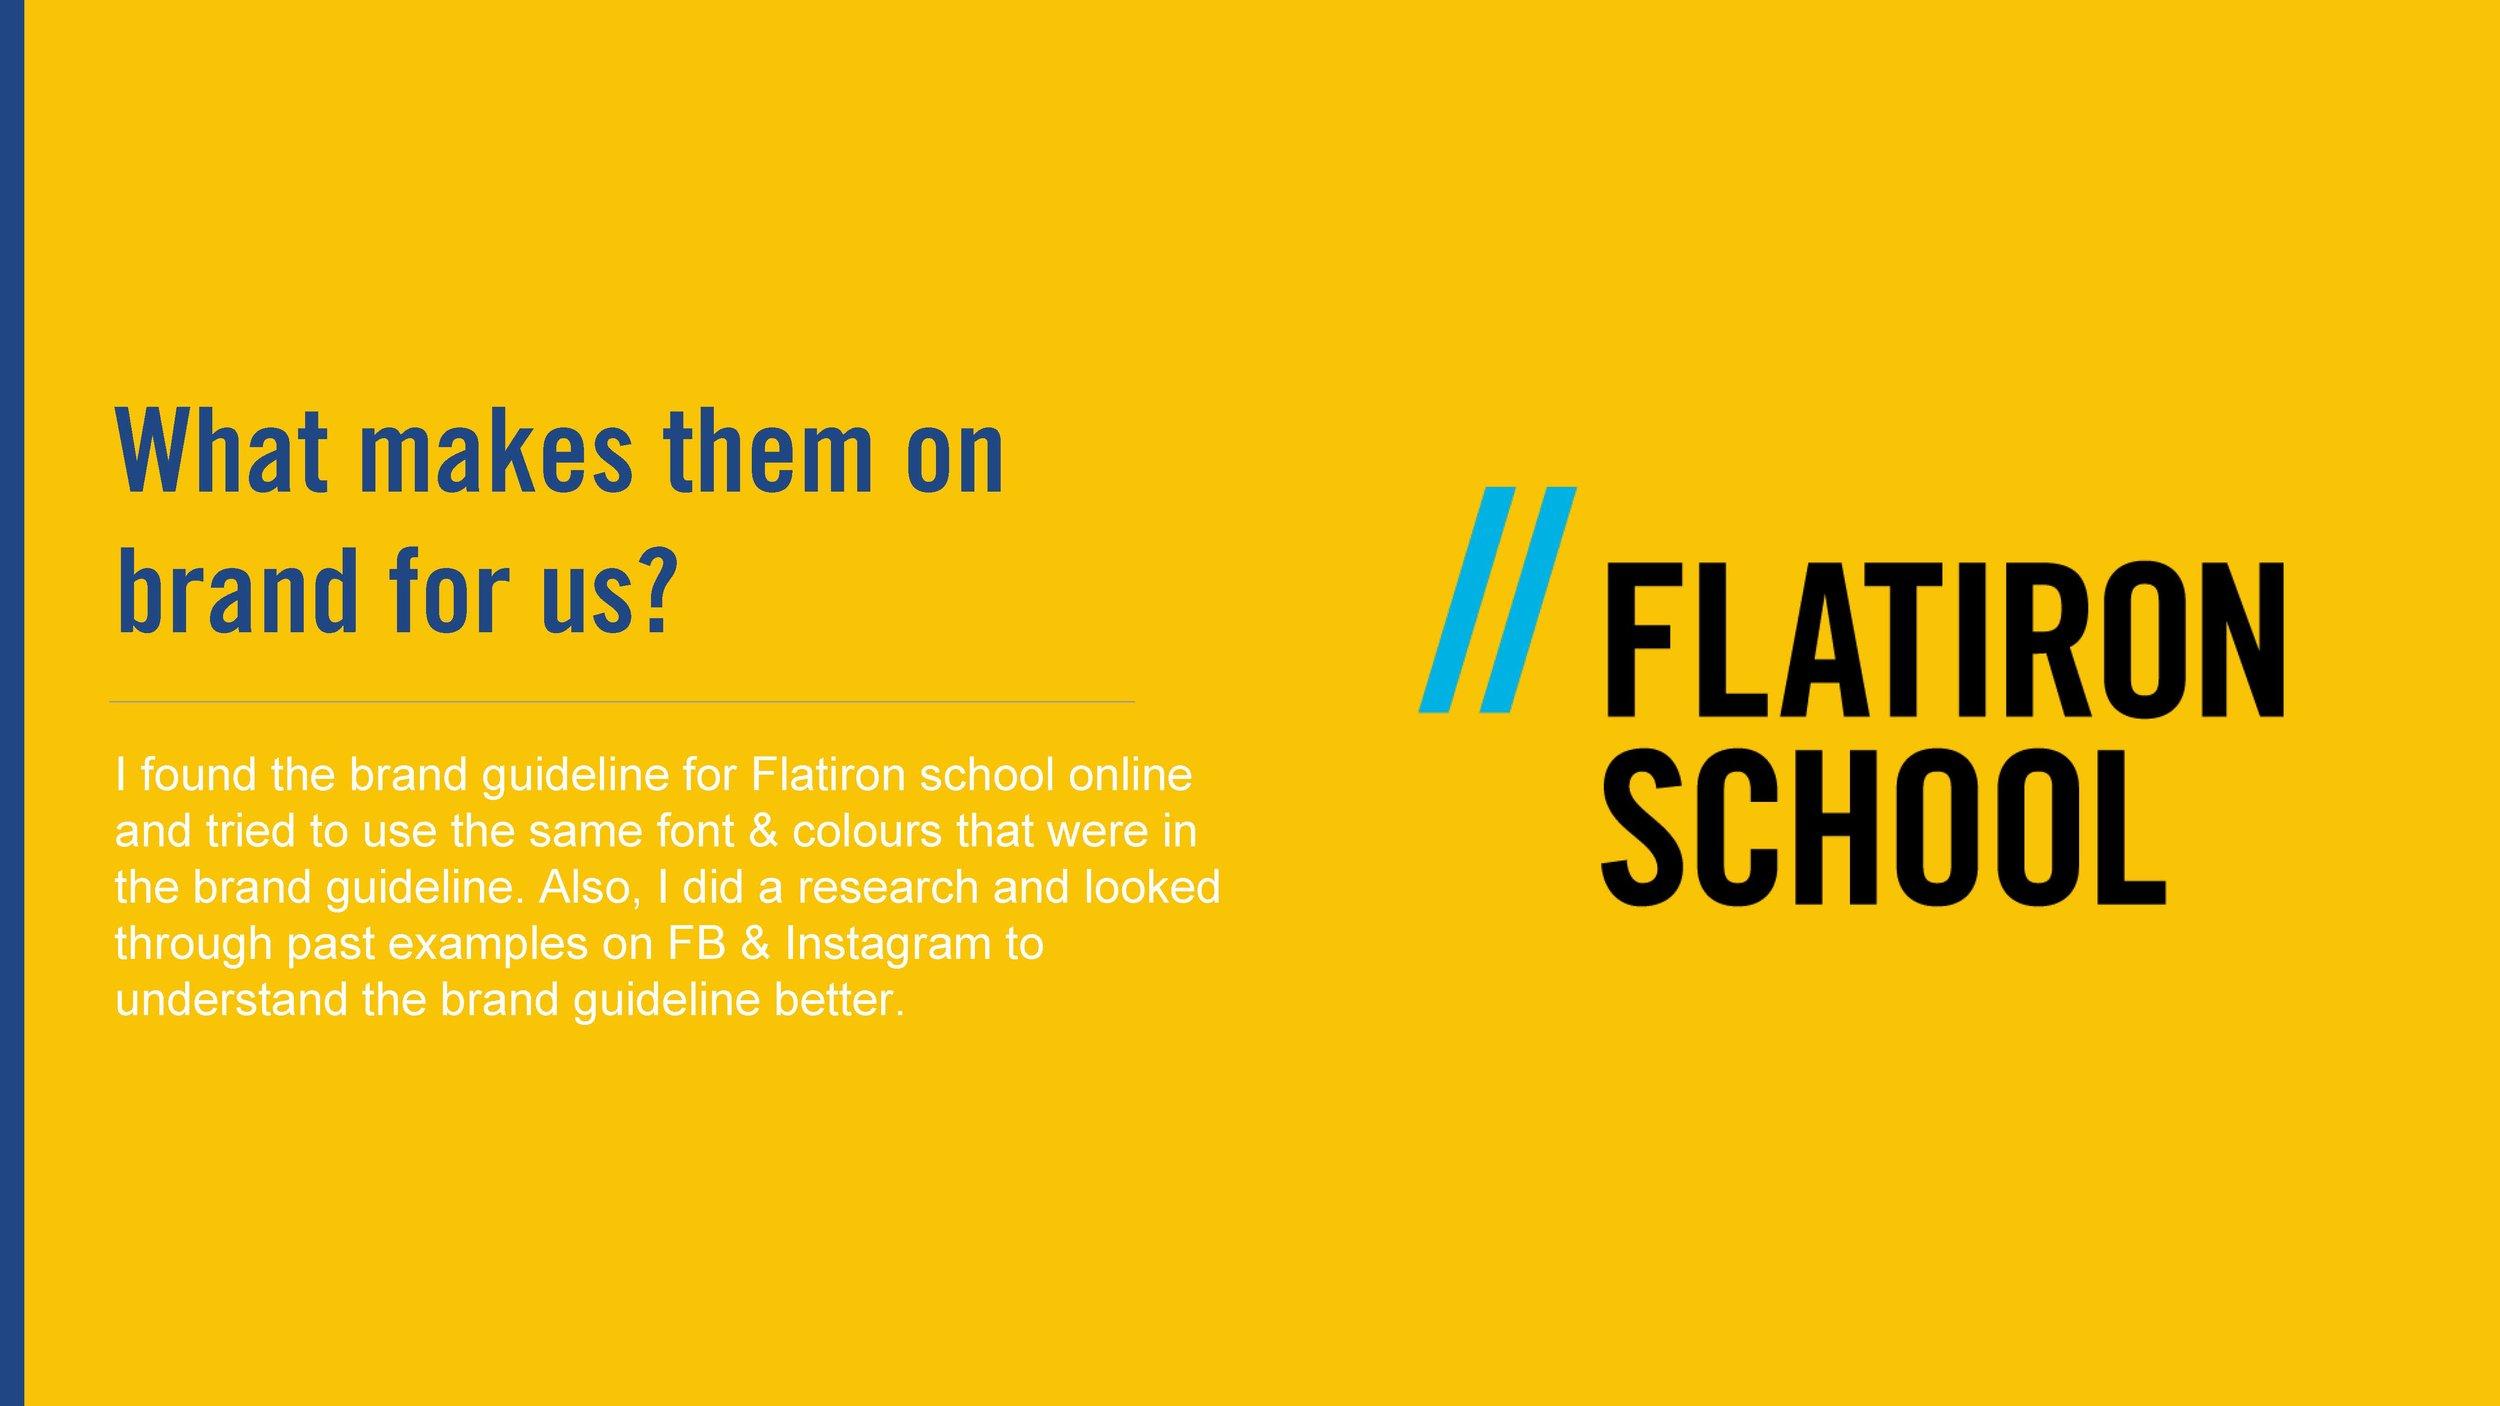 FlatironSchool_YunjooLee_Page_05.jpg